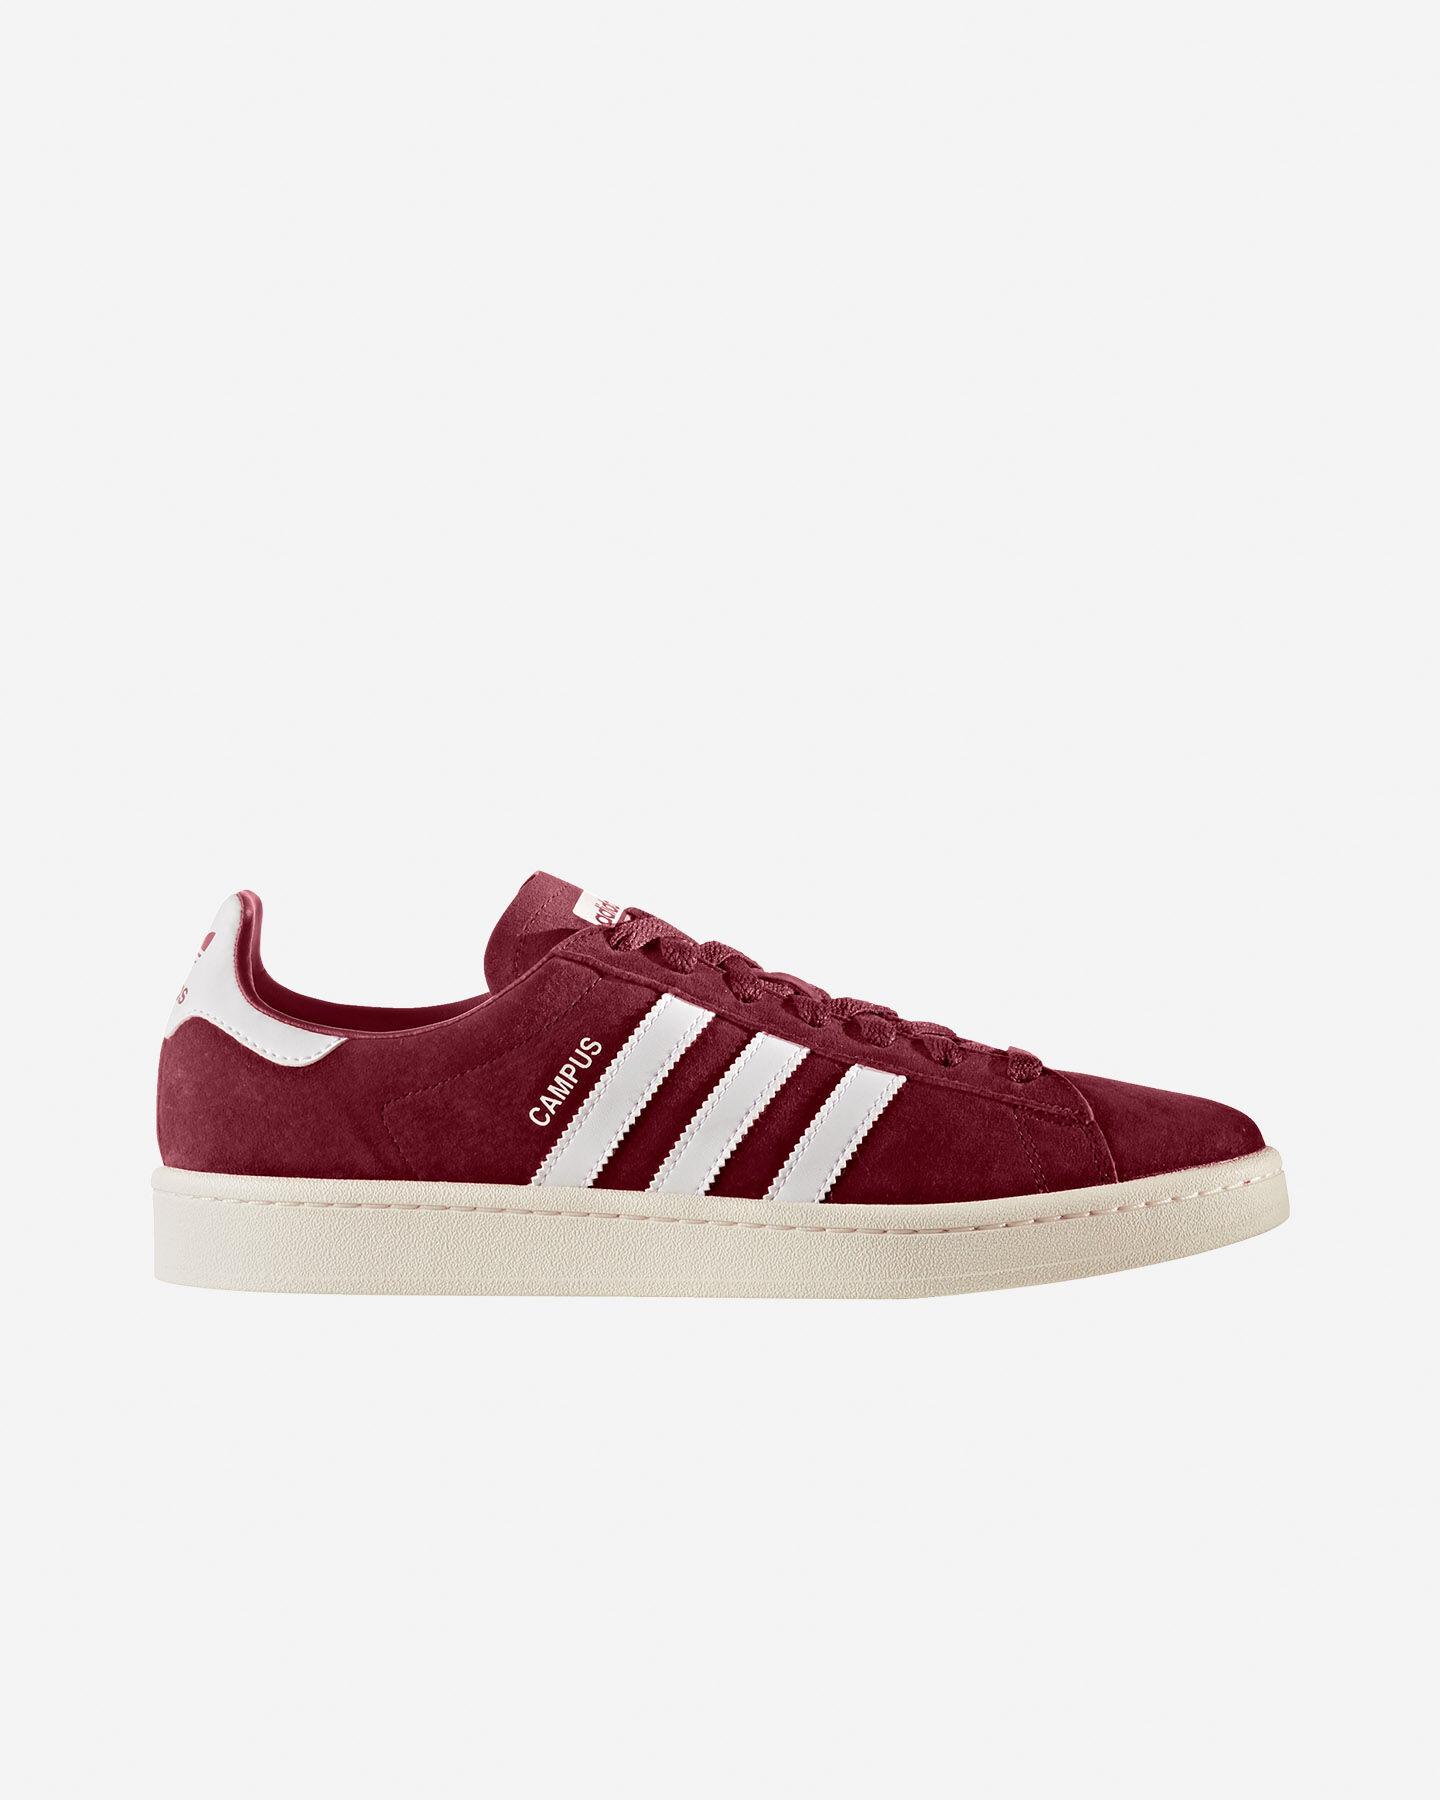 Alta qualit Sneaker Uomo Adidas BZ0087 vendita